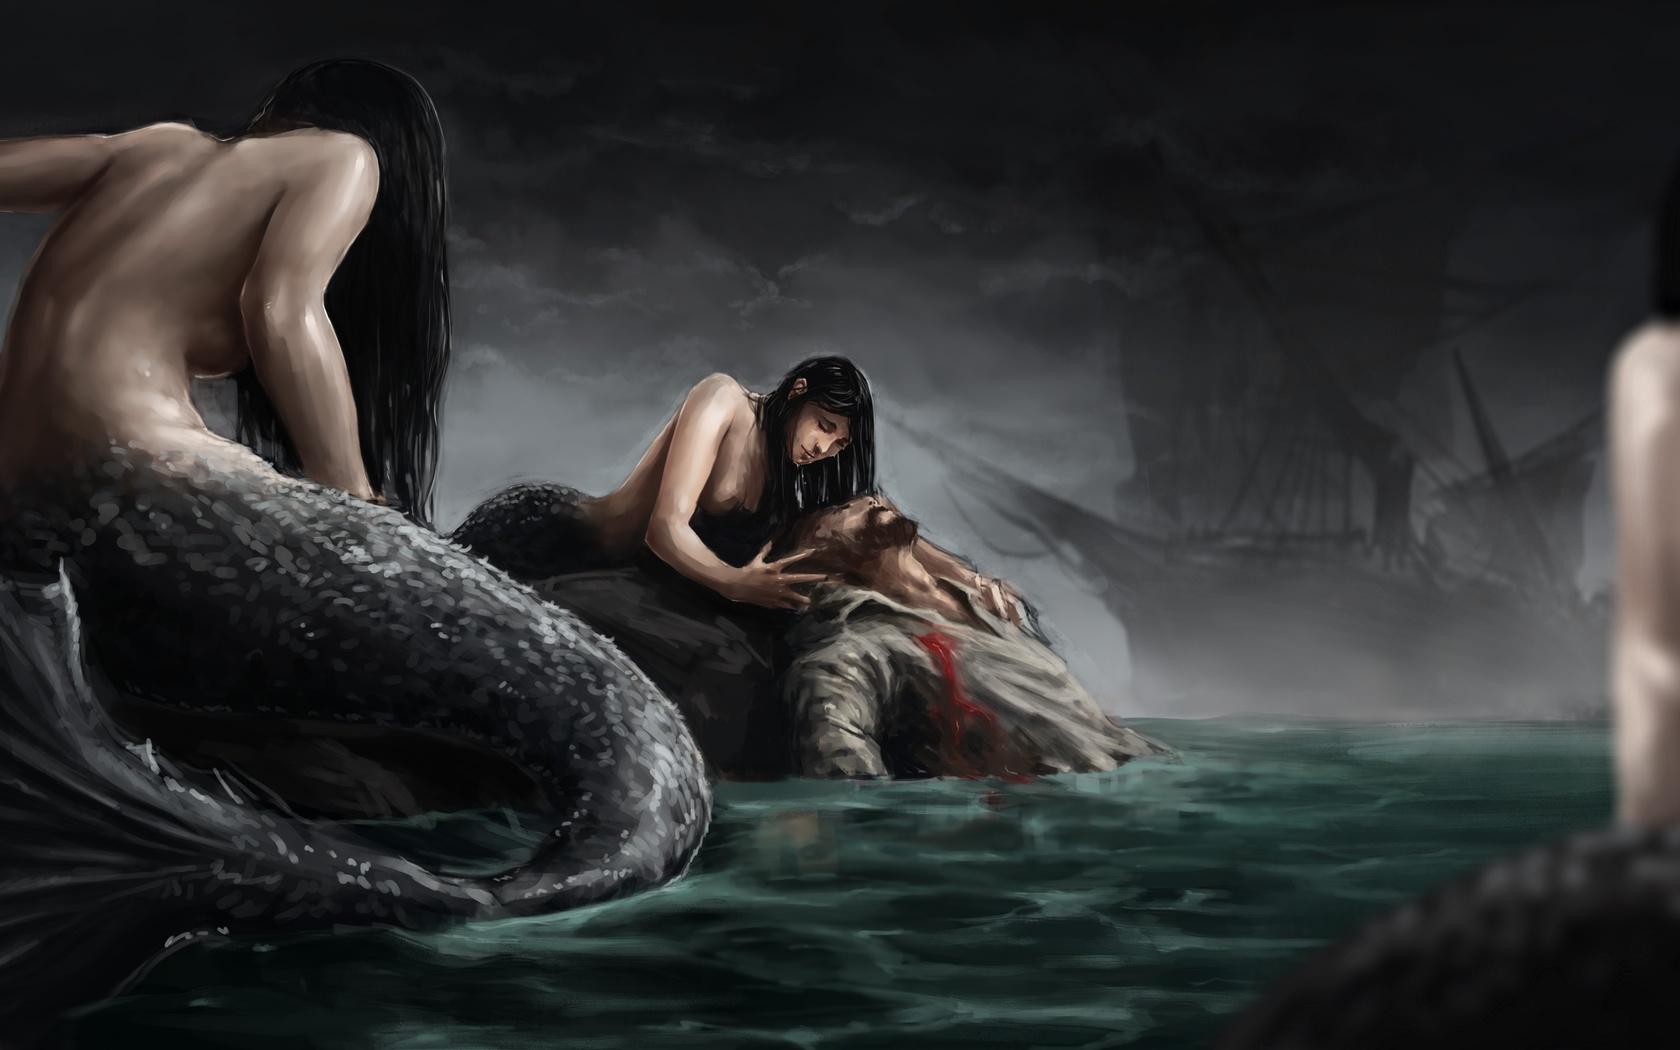 русалки, море, корабль, капитан, рана, sirens, моряк, сирены, кровь, хвост, sea, ship, captain, mermaid, wound, sailor